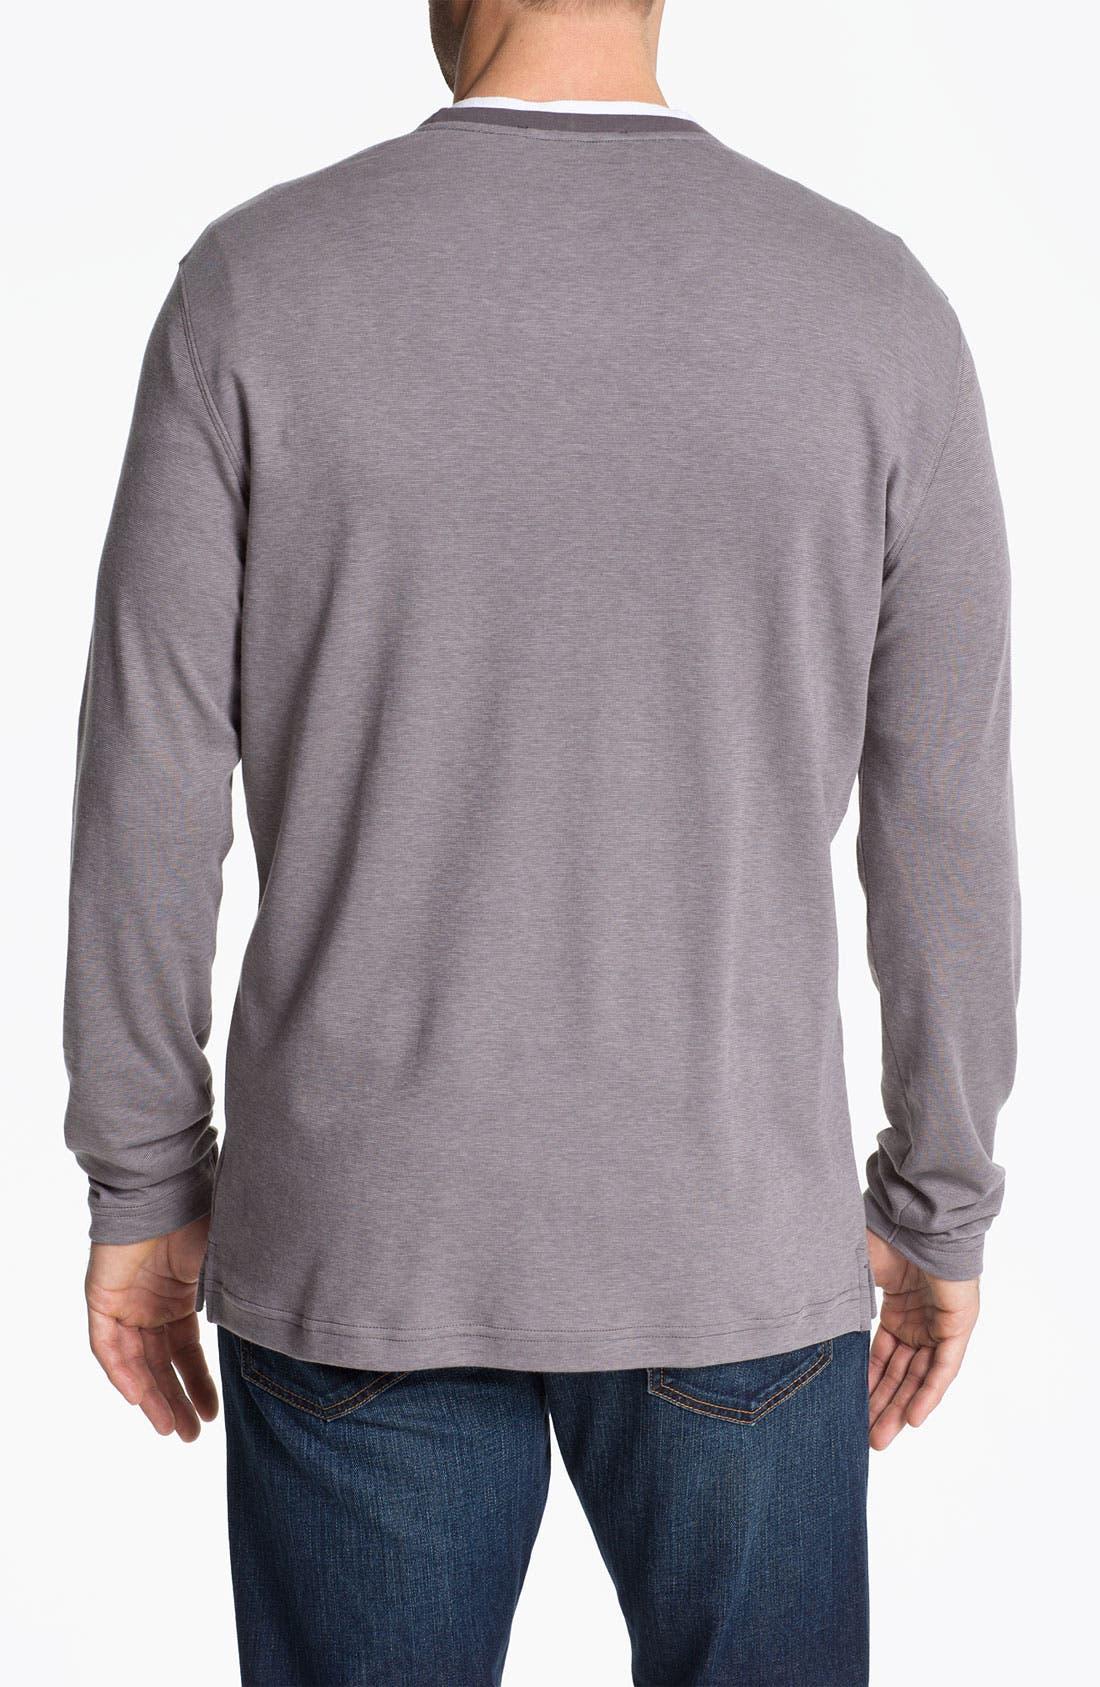 Alternate Image 2  - Robert Barakett 'Connor' Crewneck T-Shirt